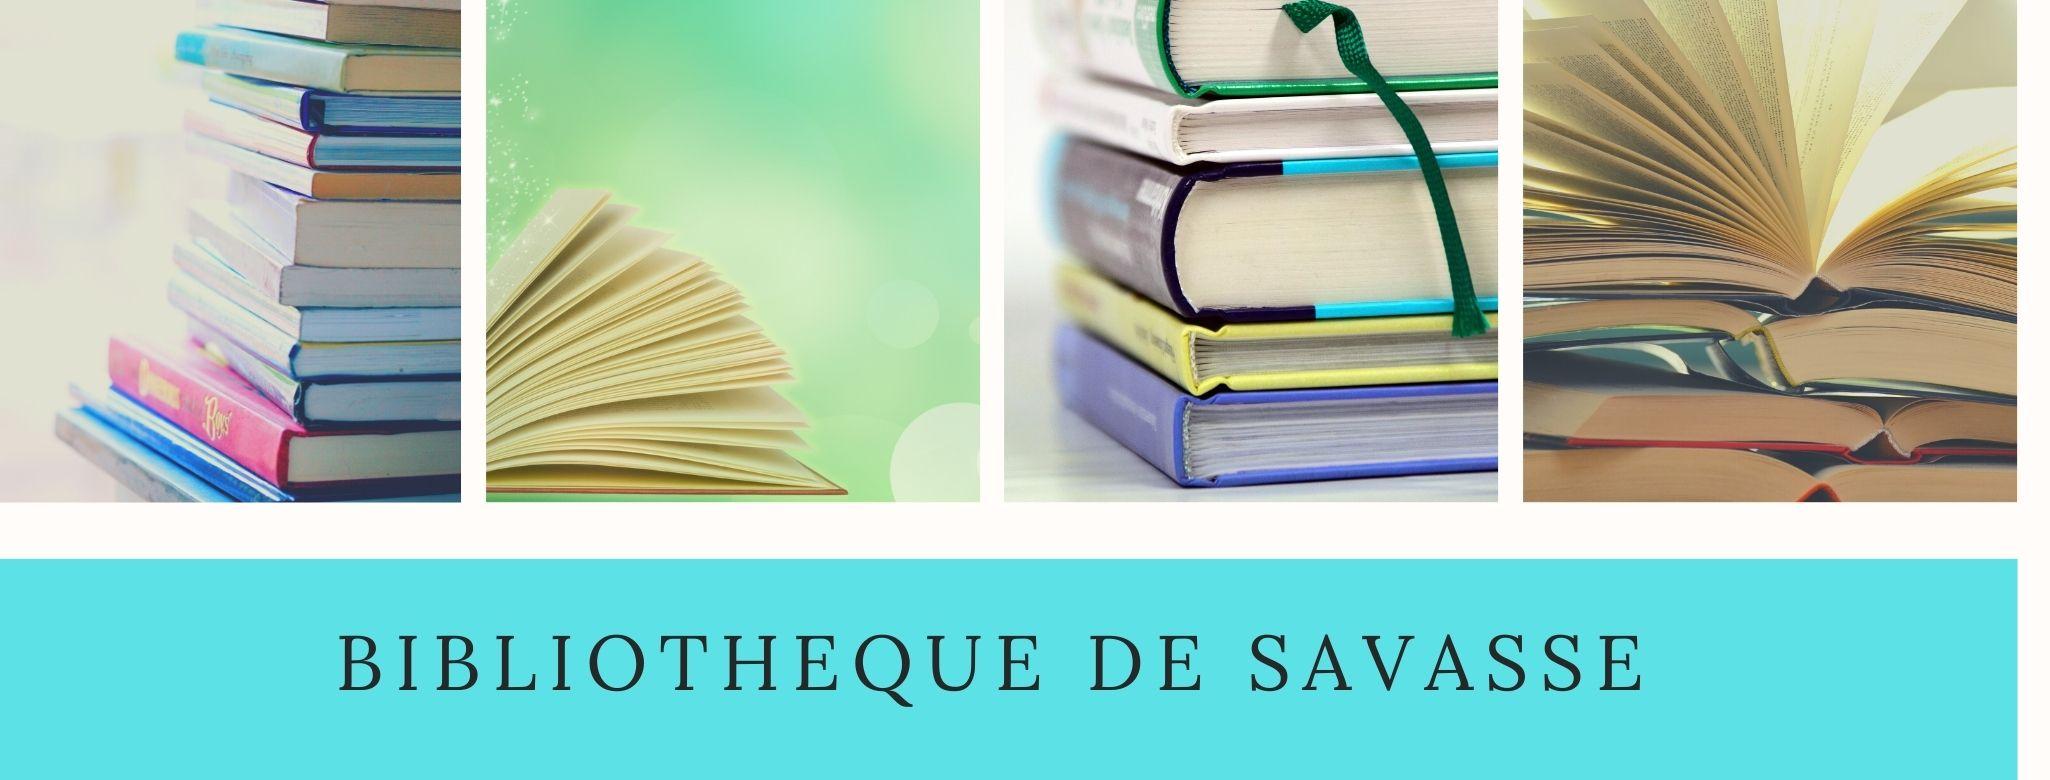 Bibliothèque de Savasse